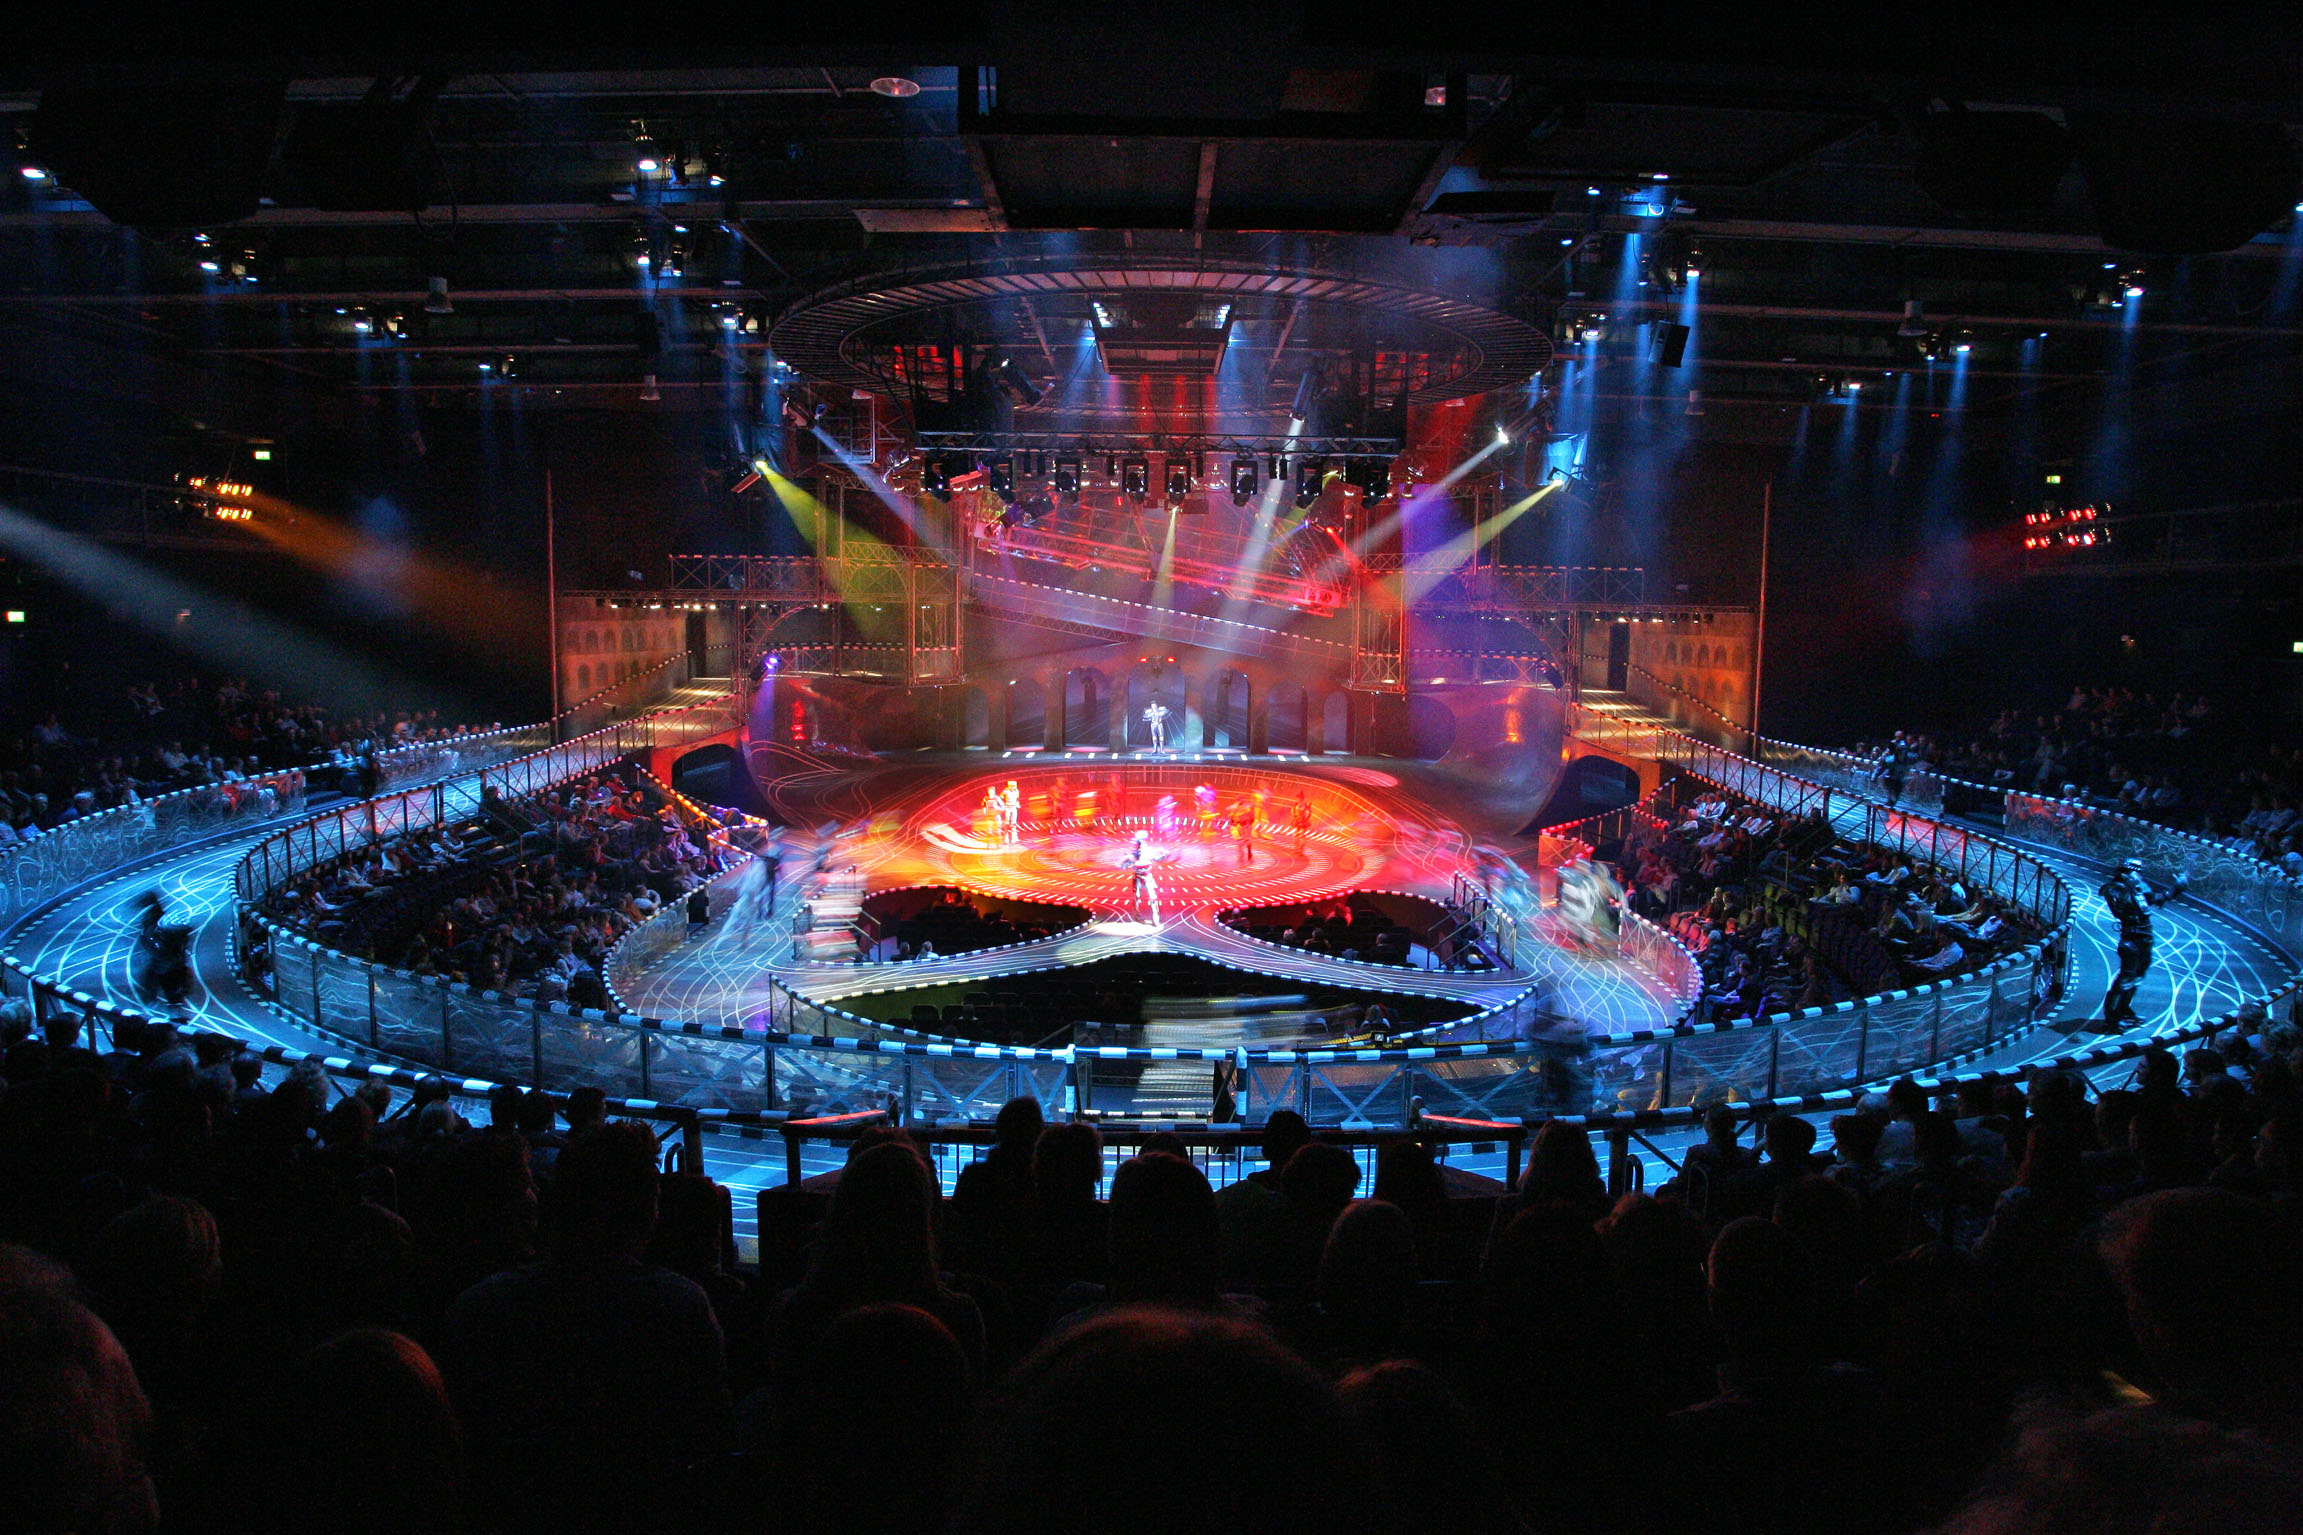 Musical Starlight Express in Bochum Paket Ticket Hotel